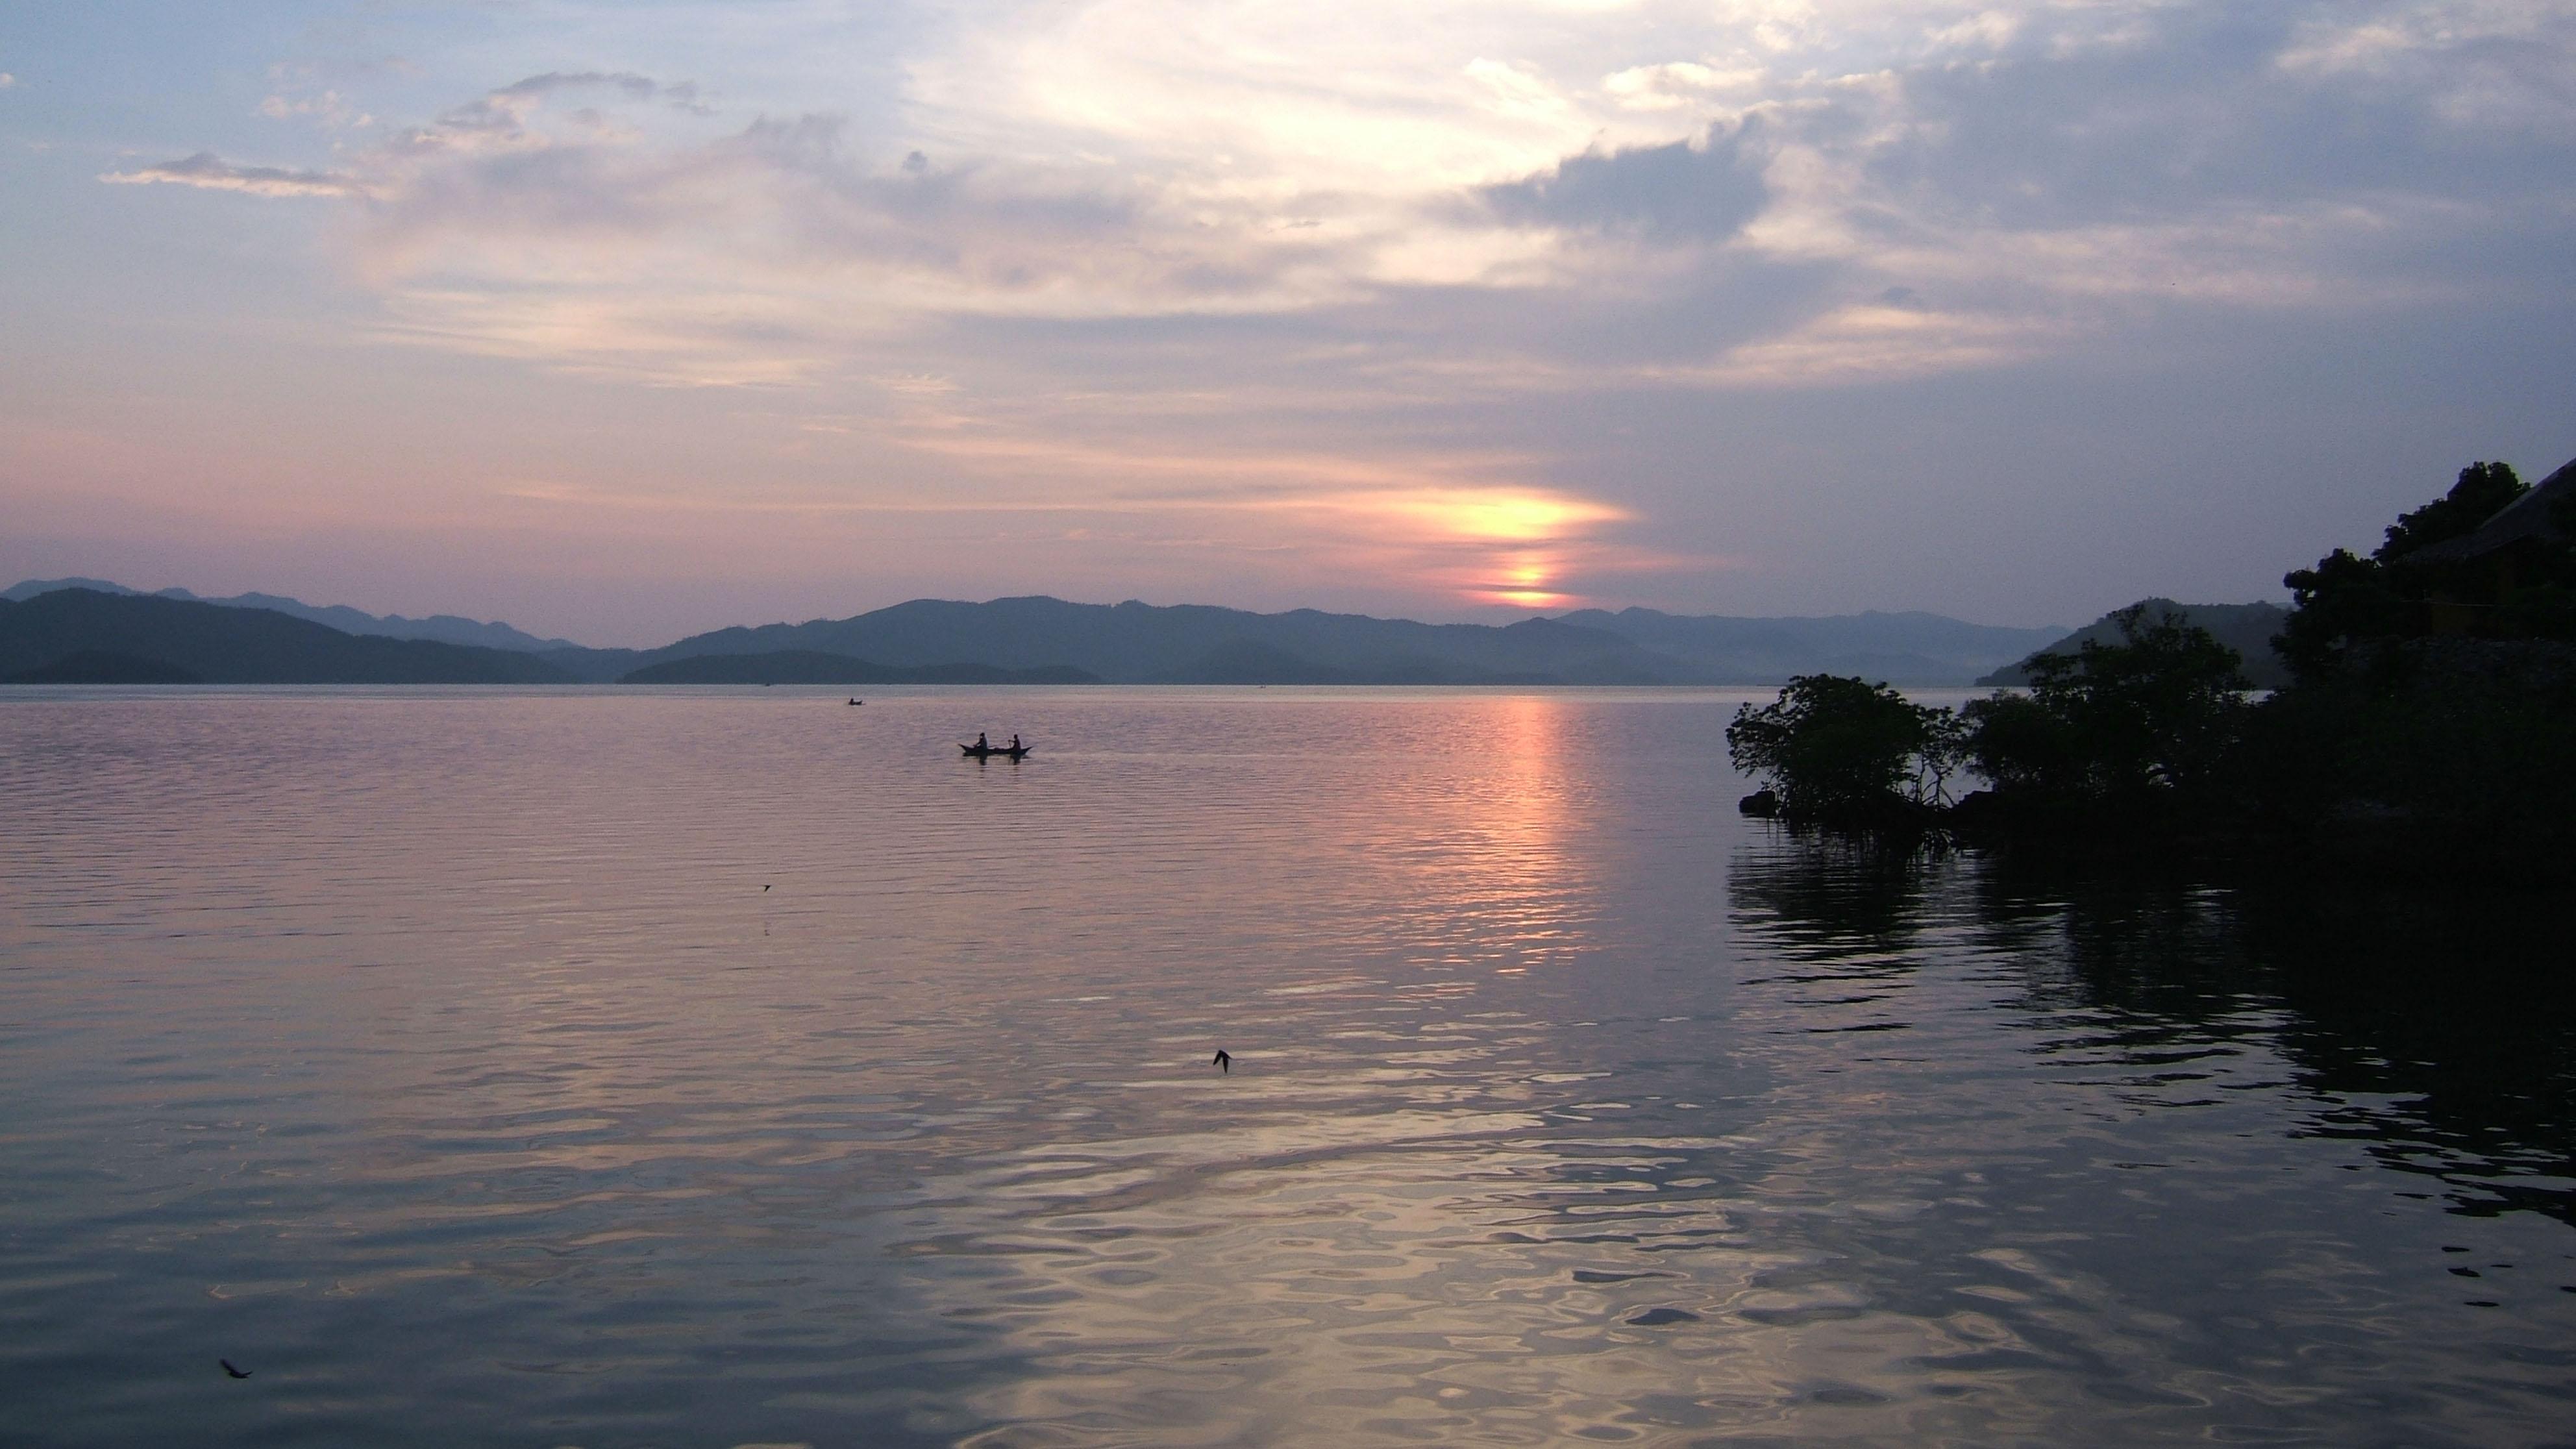 Philippines Palawan Islands CoronJuly 2005 08